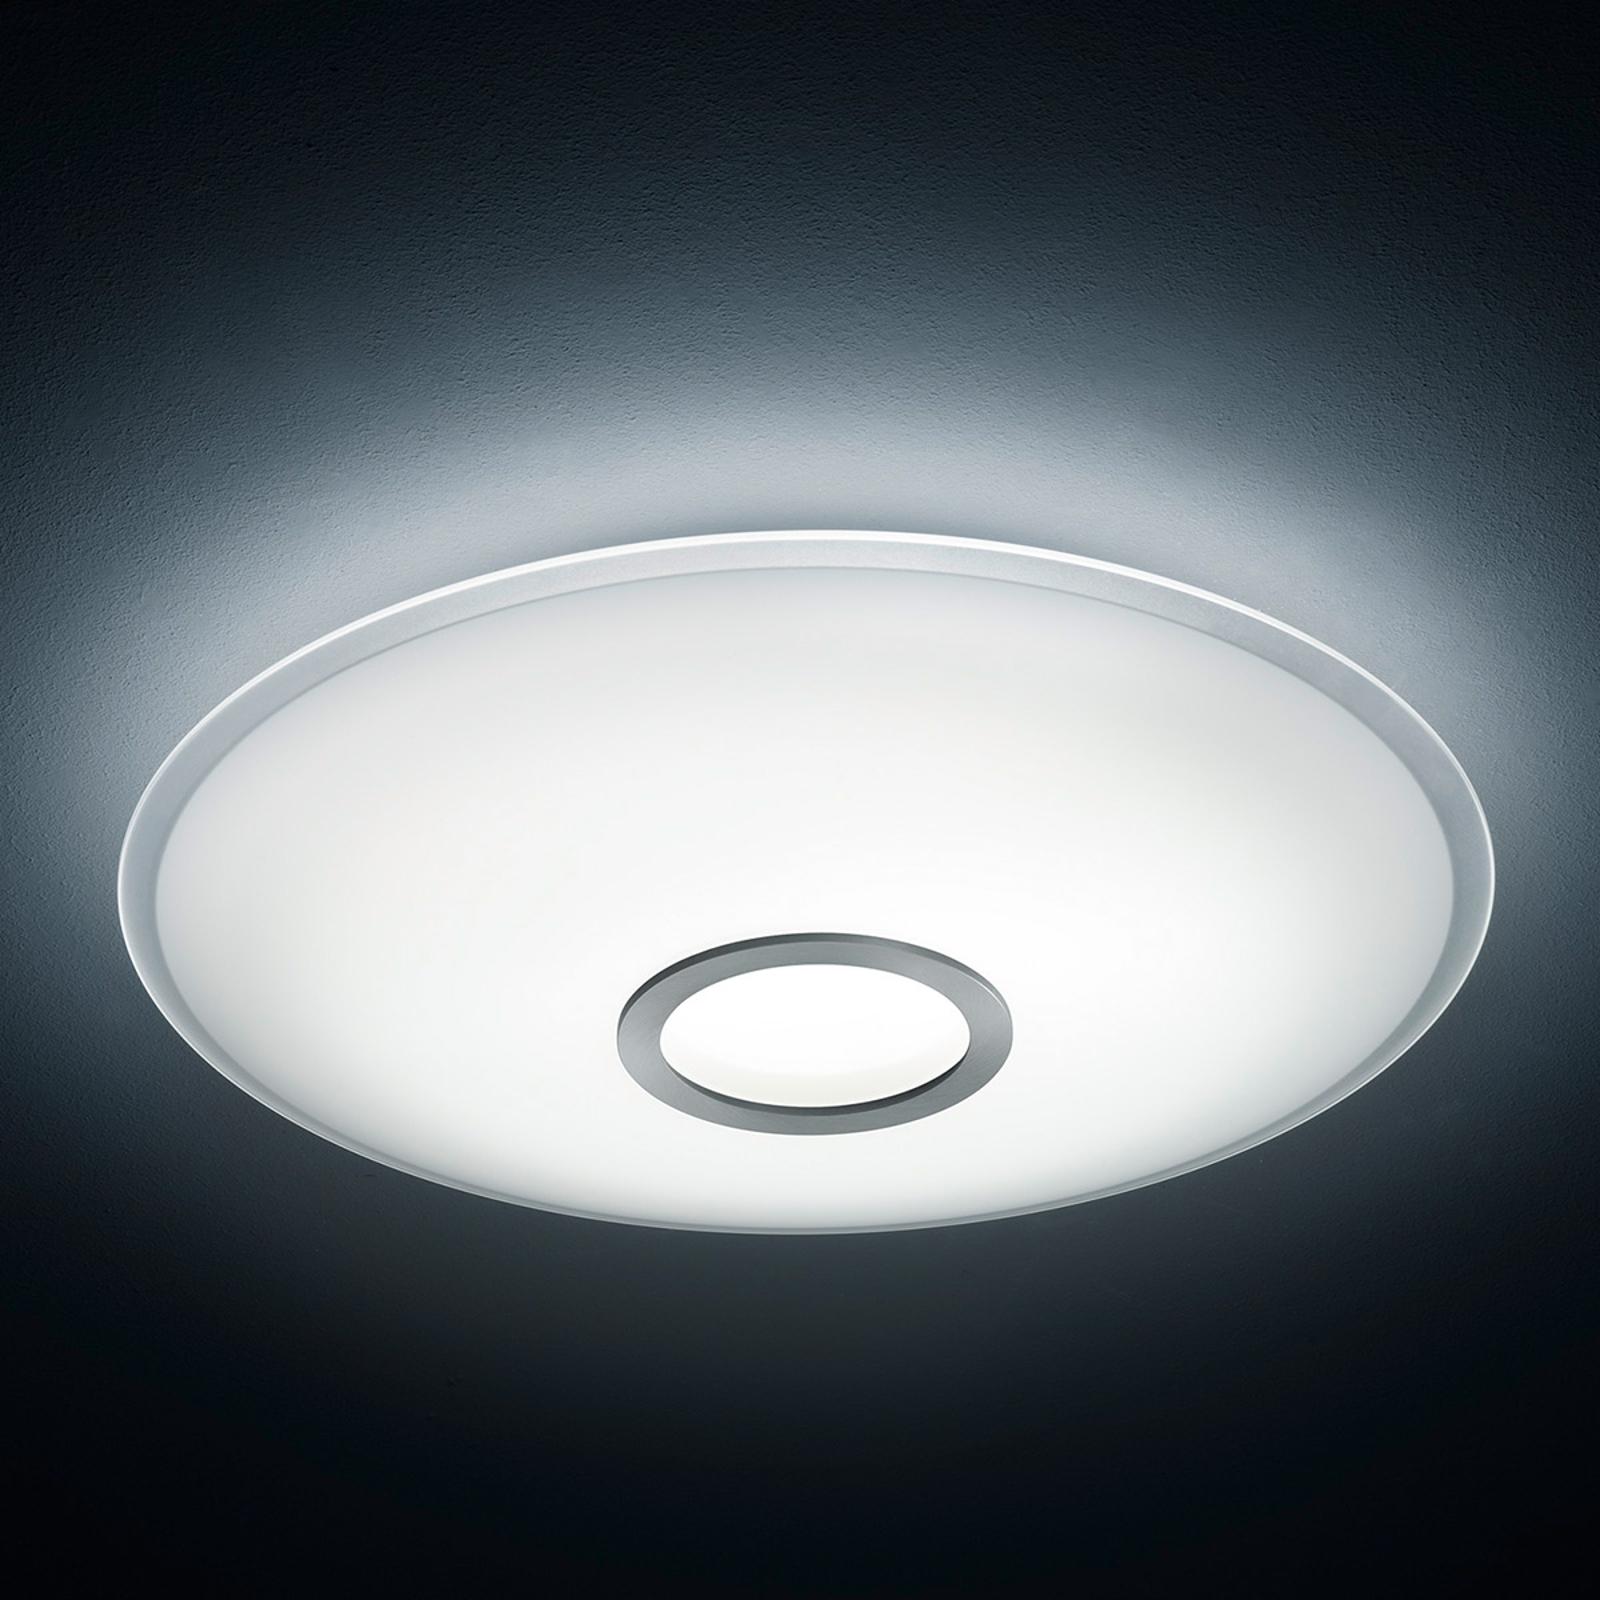 Lampa sufitowa LED NUNO matowy nikiel